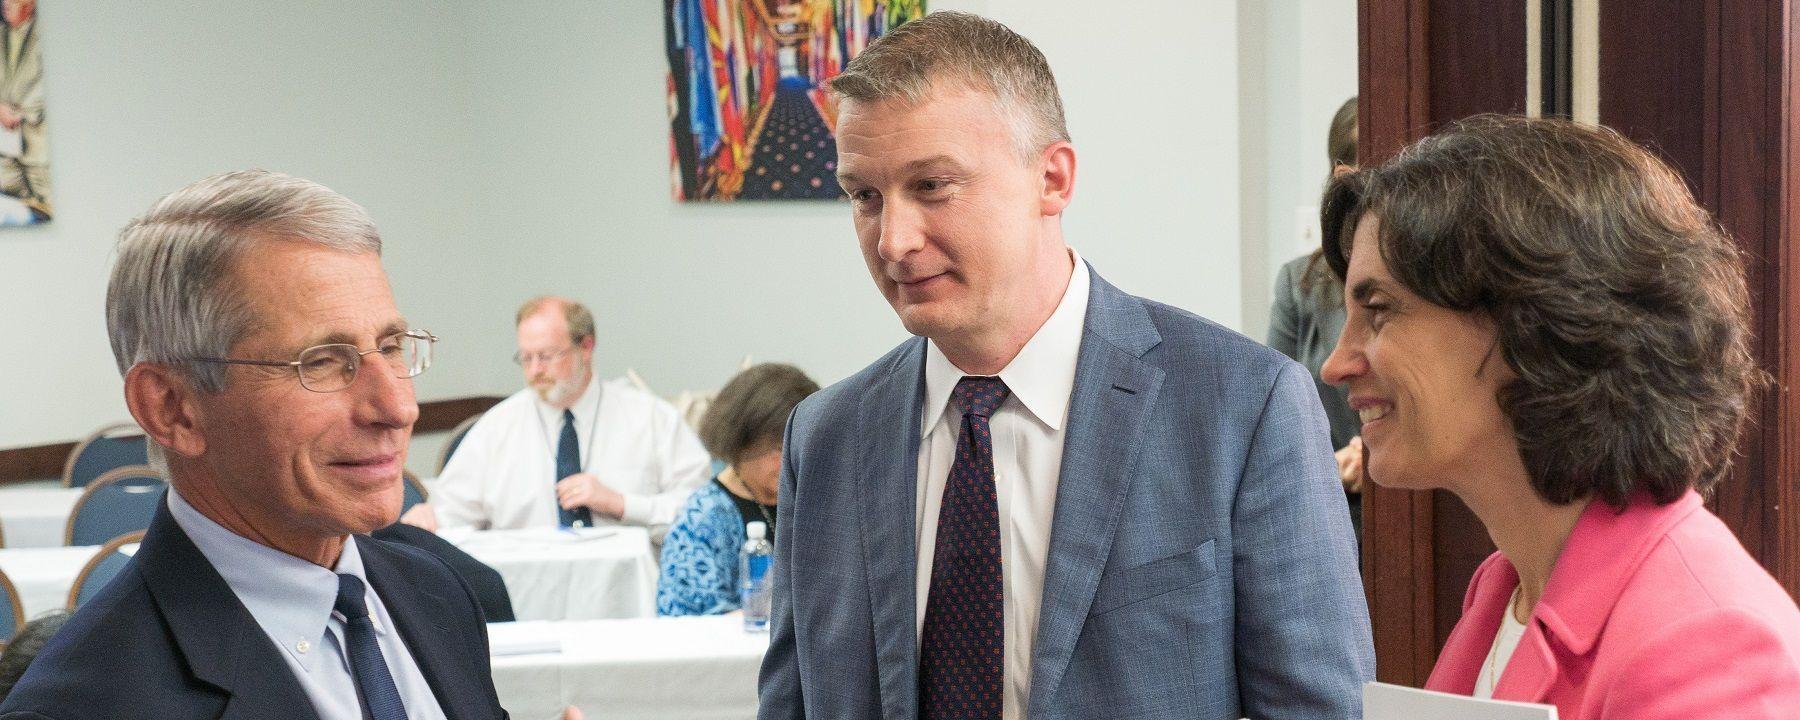 BARDA Director Departs Post Overseeing COVID-19 Vaccine Efforts